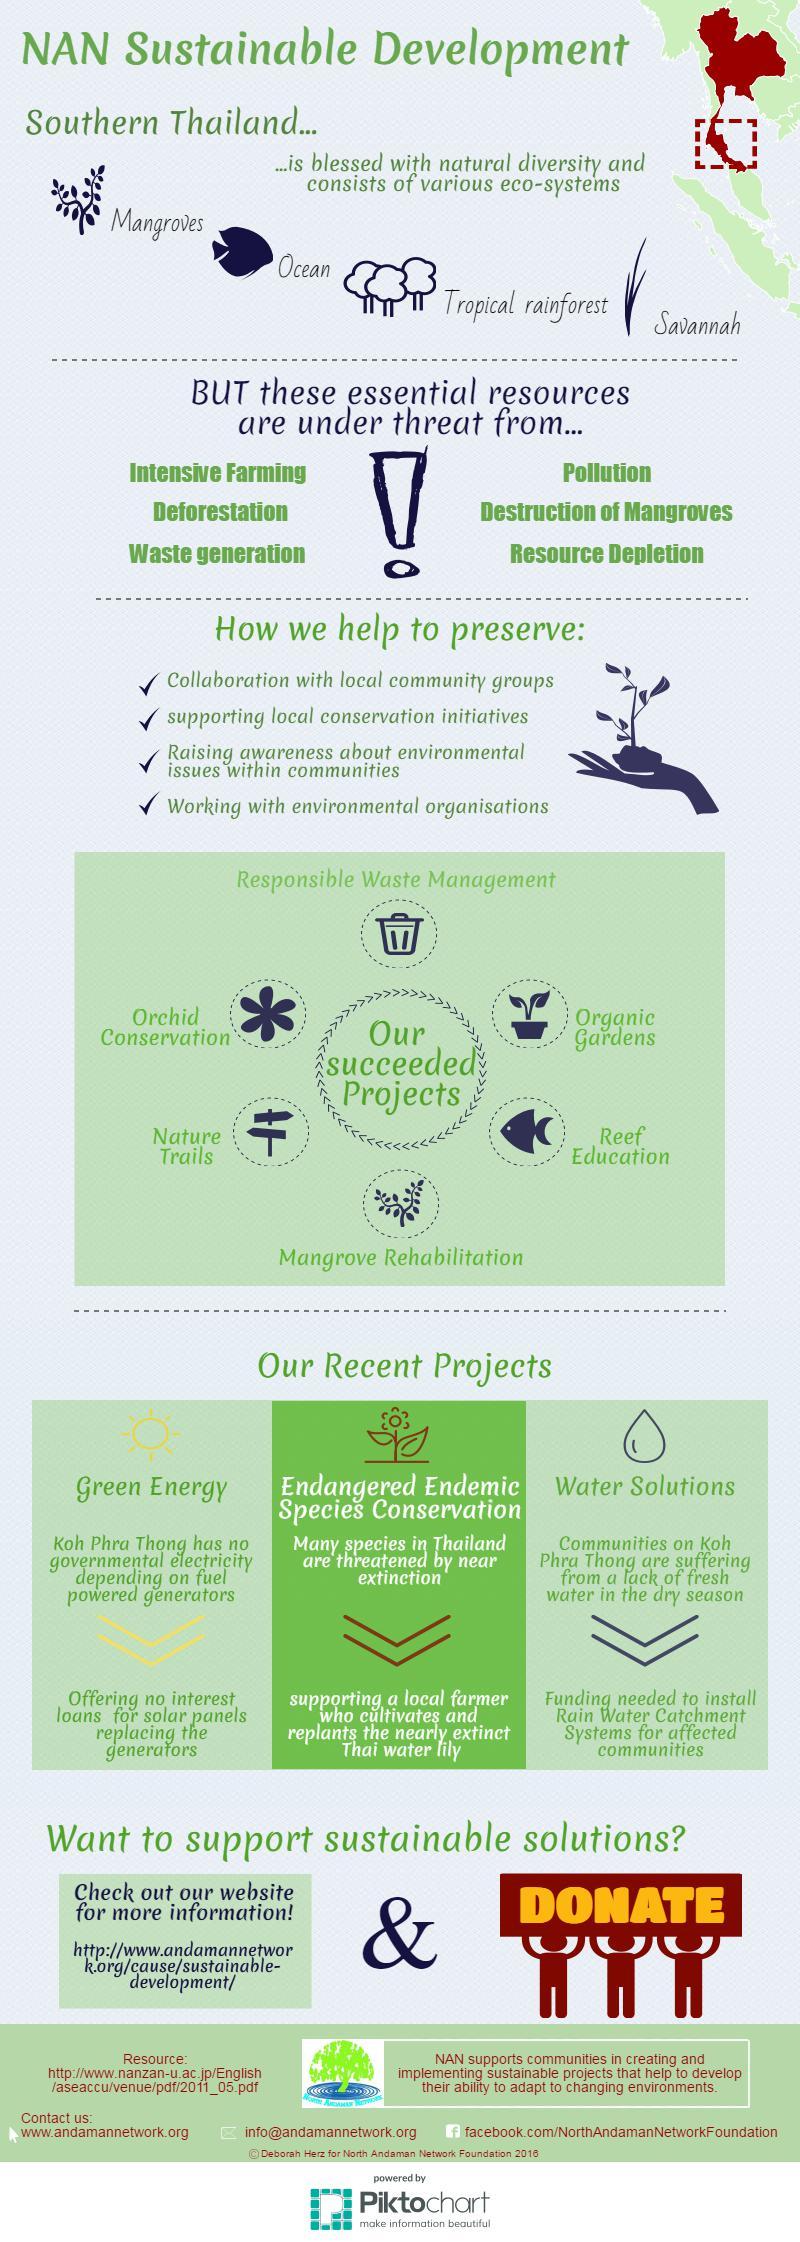 nan-sustainable-development